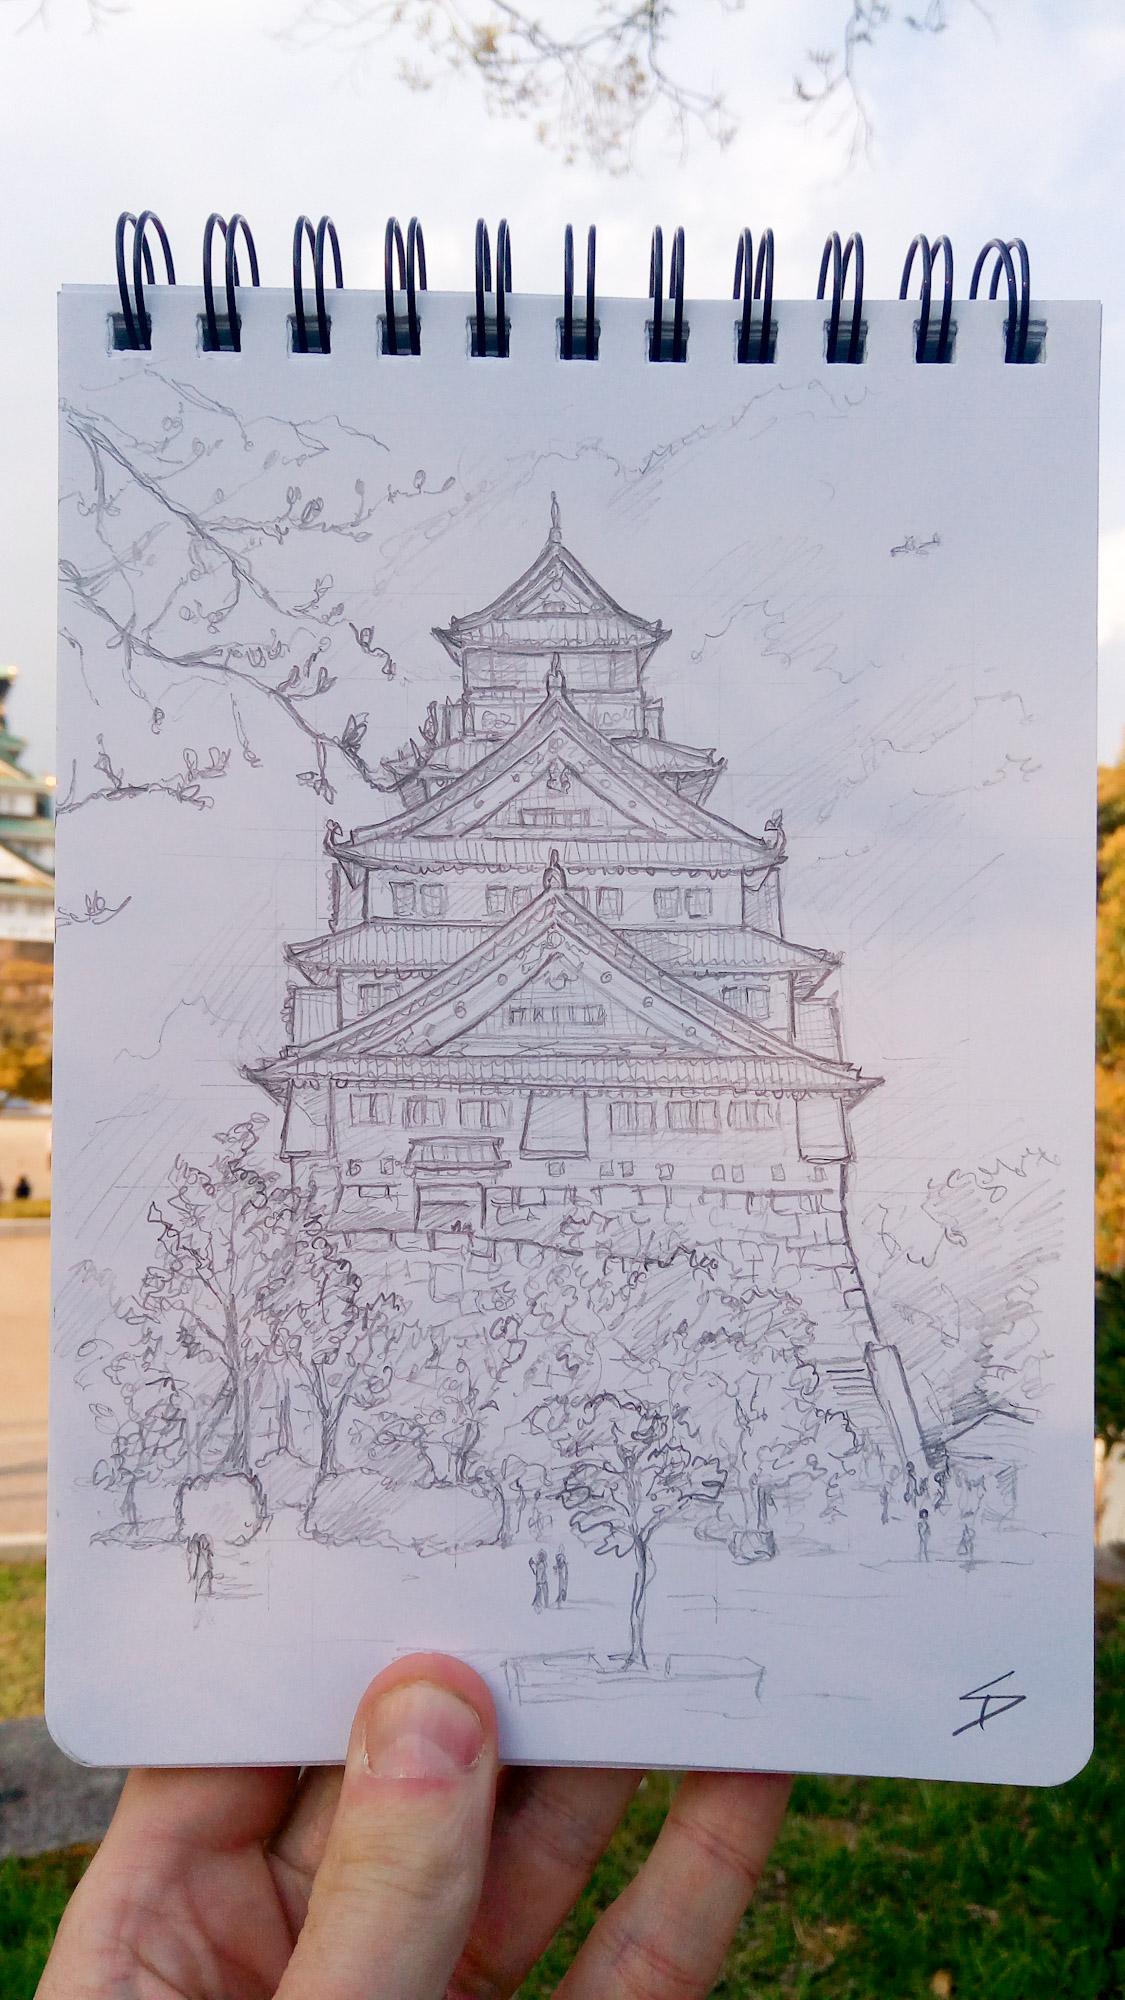 Urban photo art - Chuo Ward, Osaka, Japan. 'Osaka Castle.' The castle has stared in film and television - 'Godzilla Raids Again,''Shogun' and the James Bond film 'You only live twice.' sketchbookexplorer.com @davidasutton @sketchbookexplorer Facebook.com/davidanthonysutton #japan #osaka #chuoward #osakacastle #travel #travelblog #photography #art #sketching #cheeryblossom #cherryblossomseason